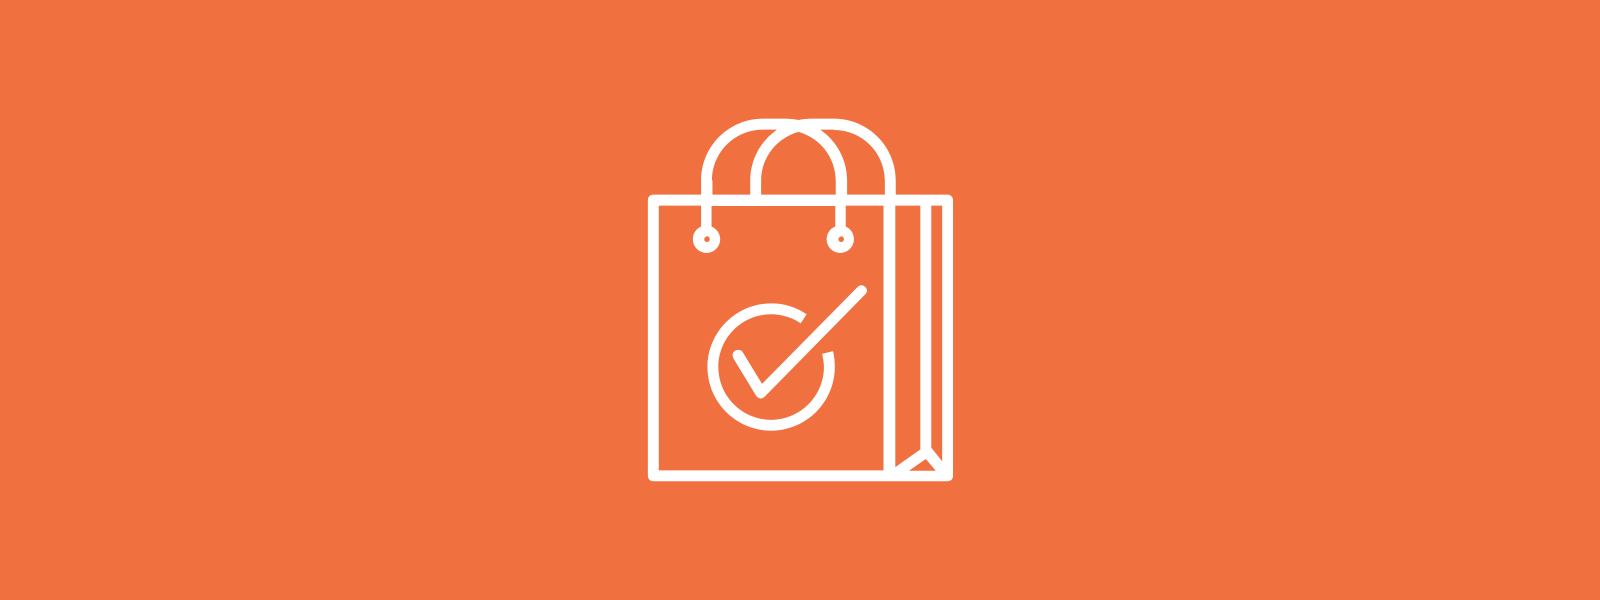 Icon background of shopping bag